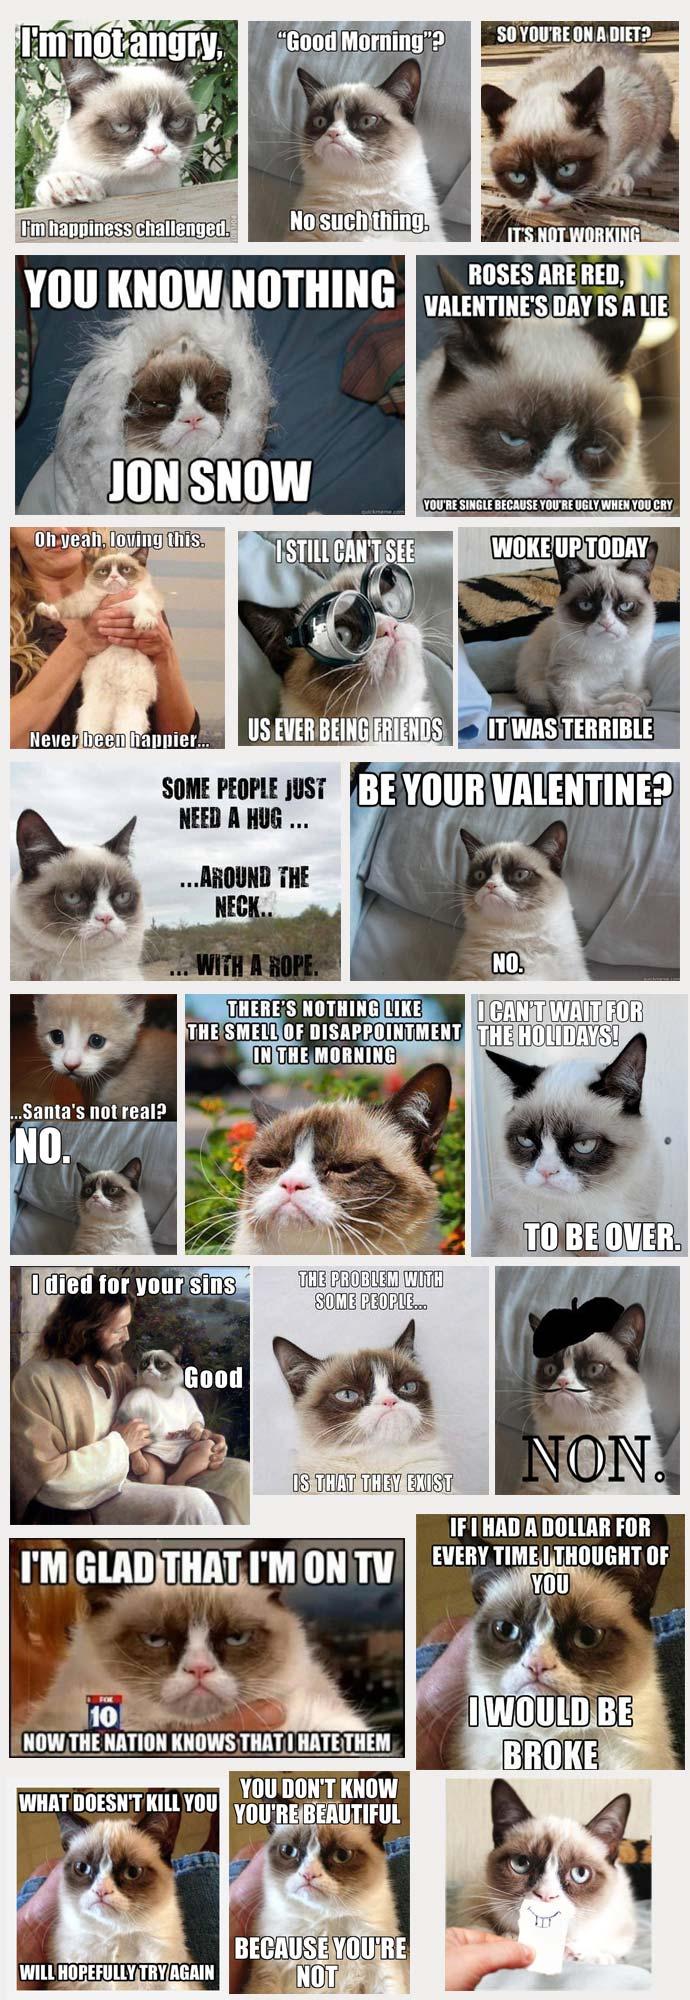 14-12-best-grumpy-cat-meme-compilation-wealthy